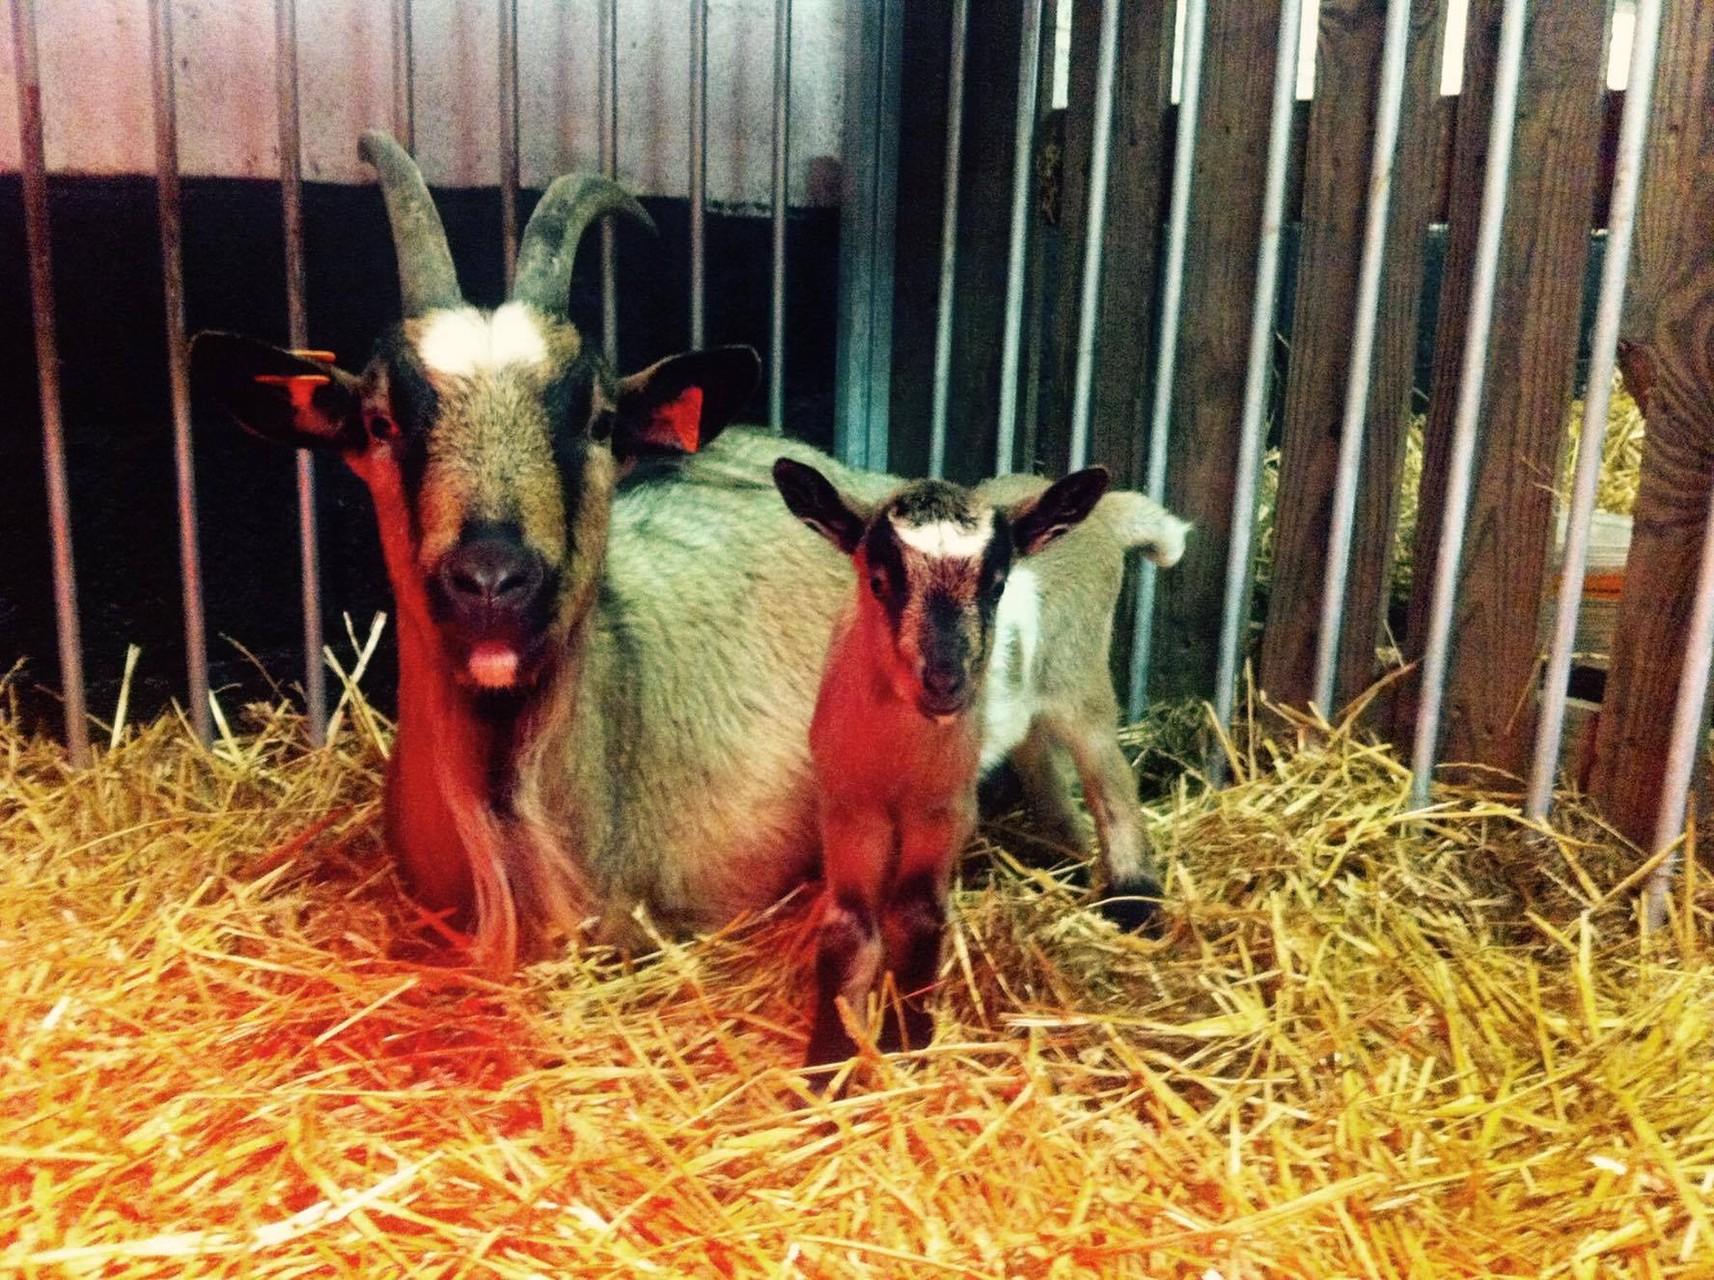 Vlaamse geit - Illys met dochter Nala